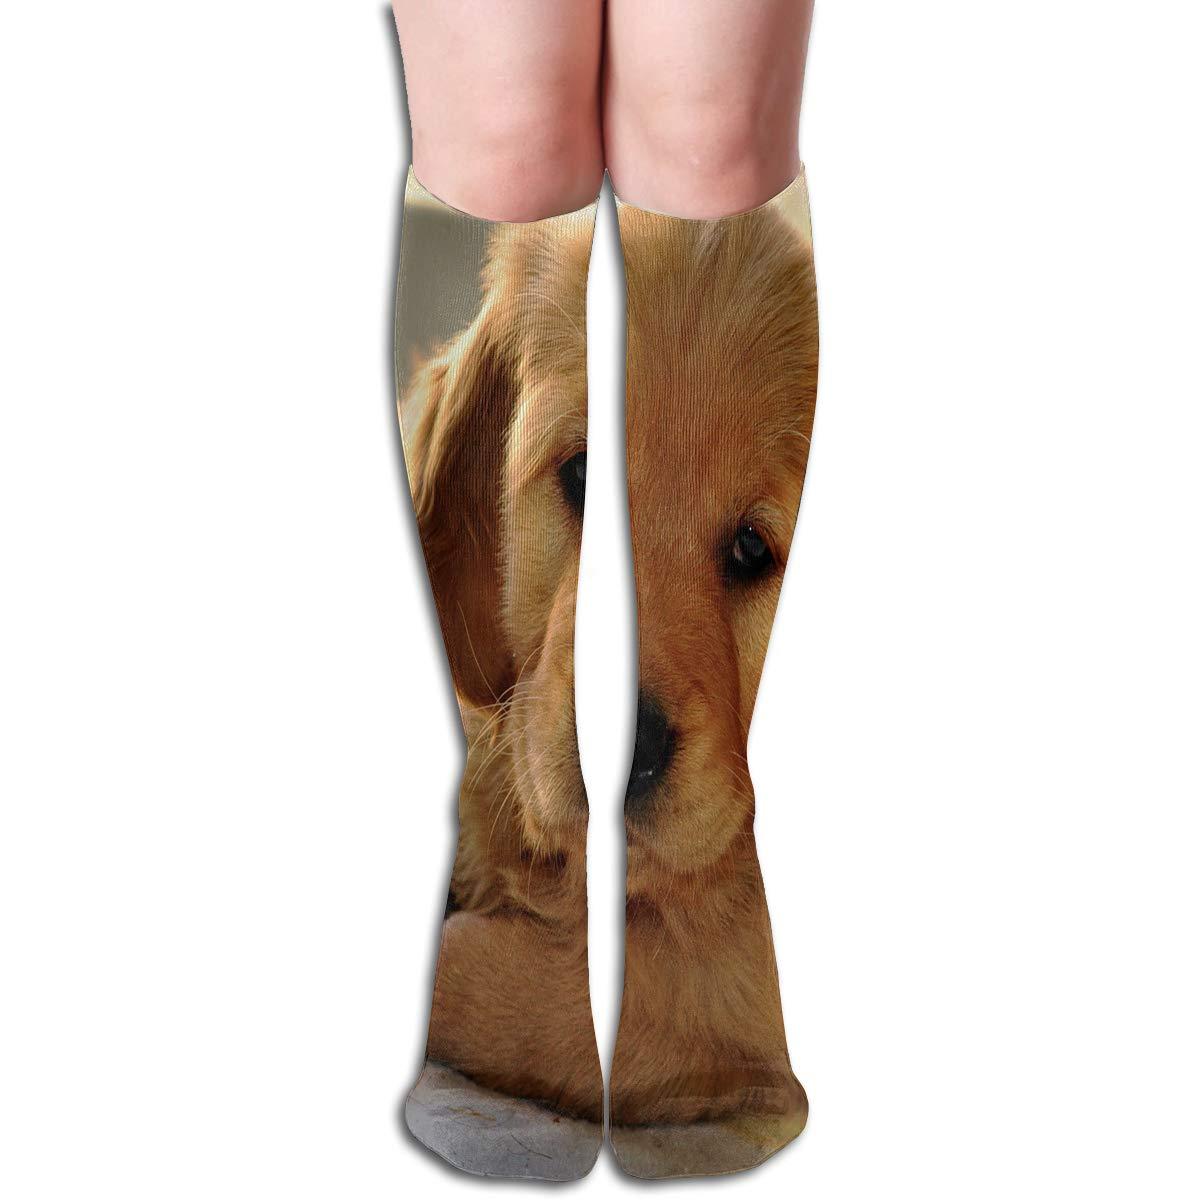 Women Socks Over Knee Golden Retriever Puppies Picture Winter Fabulous For Easter